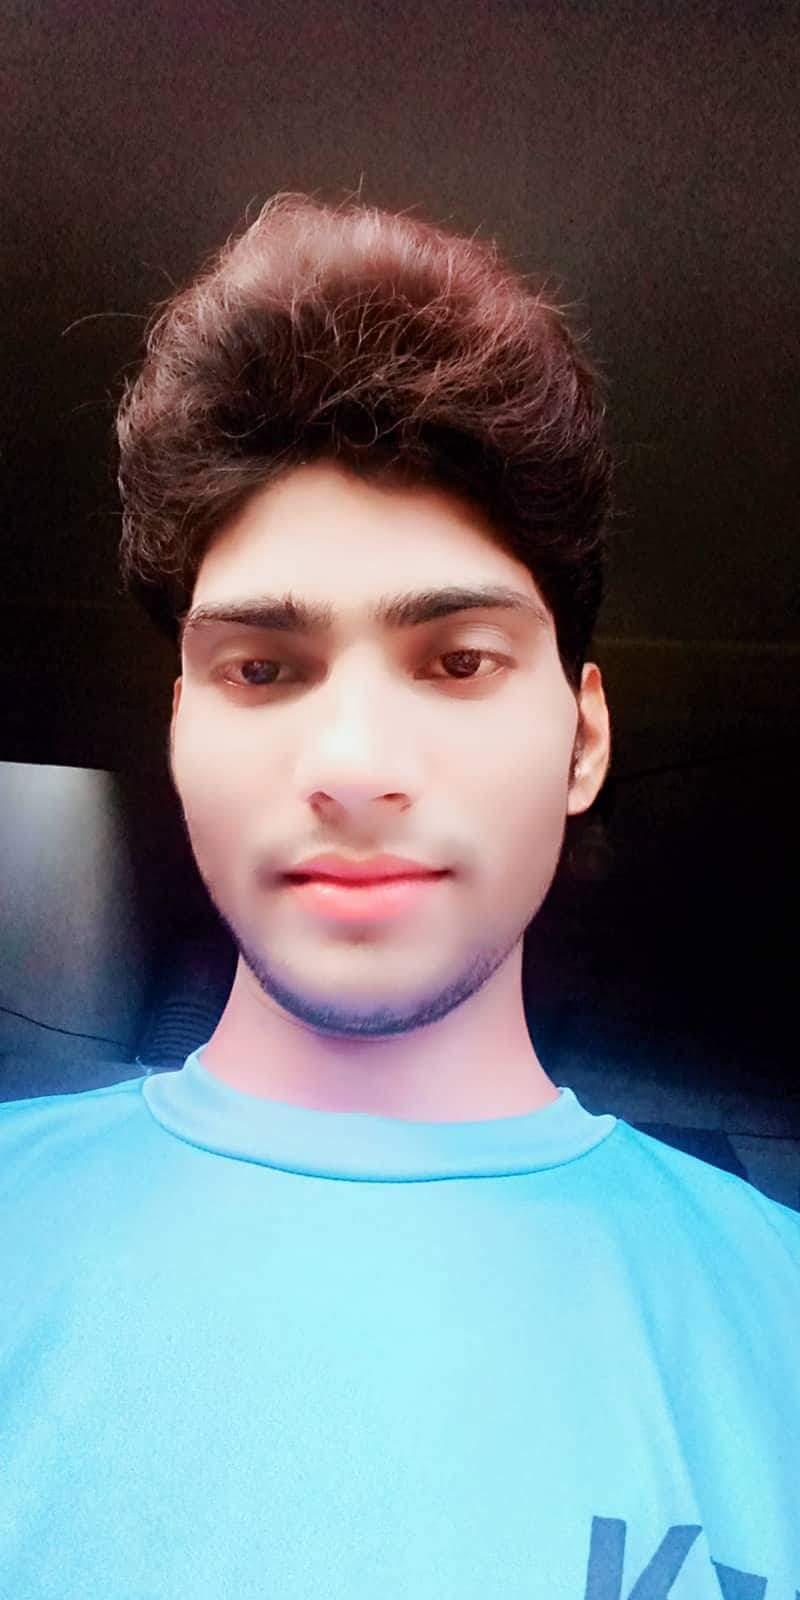 mohammad javed Avatar